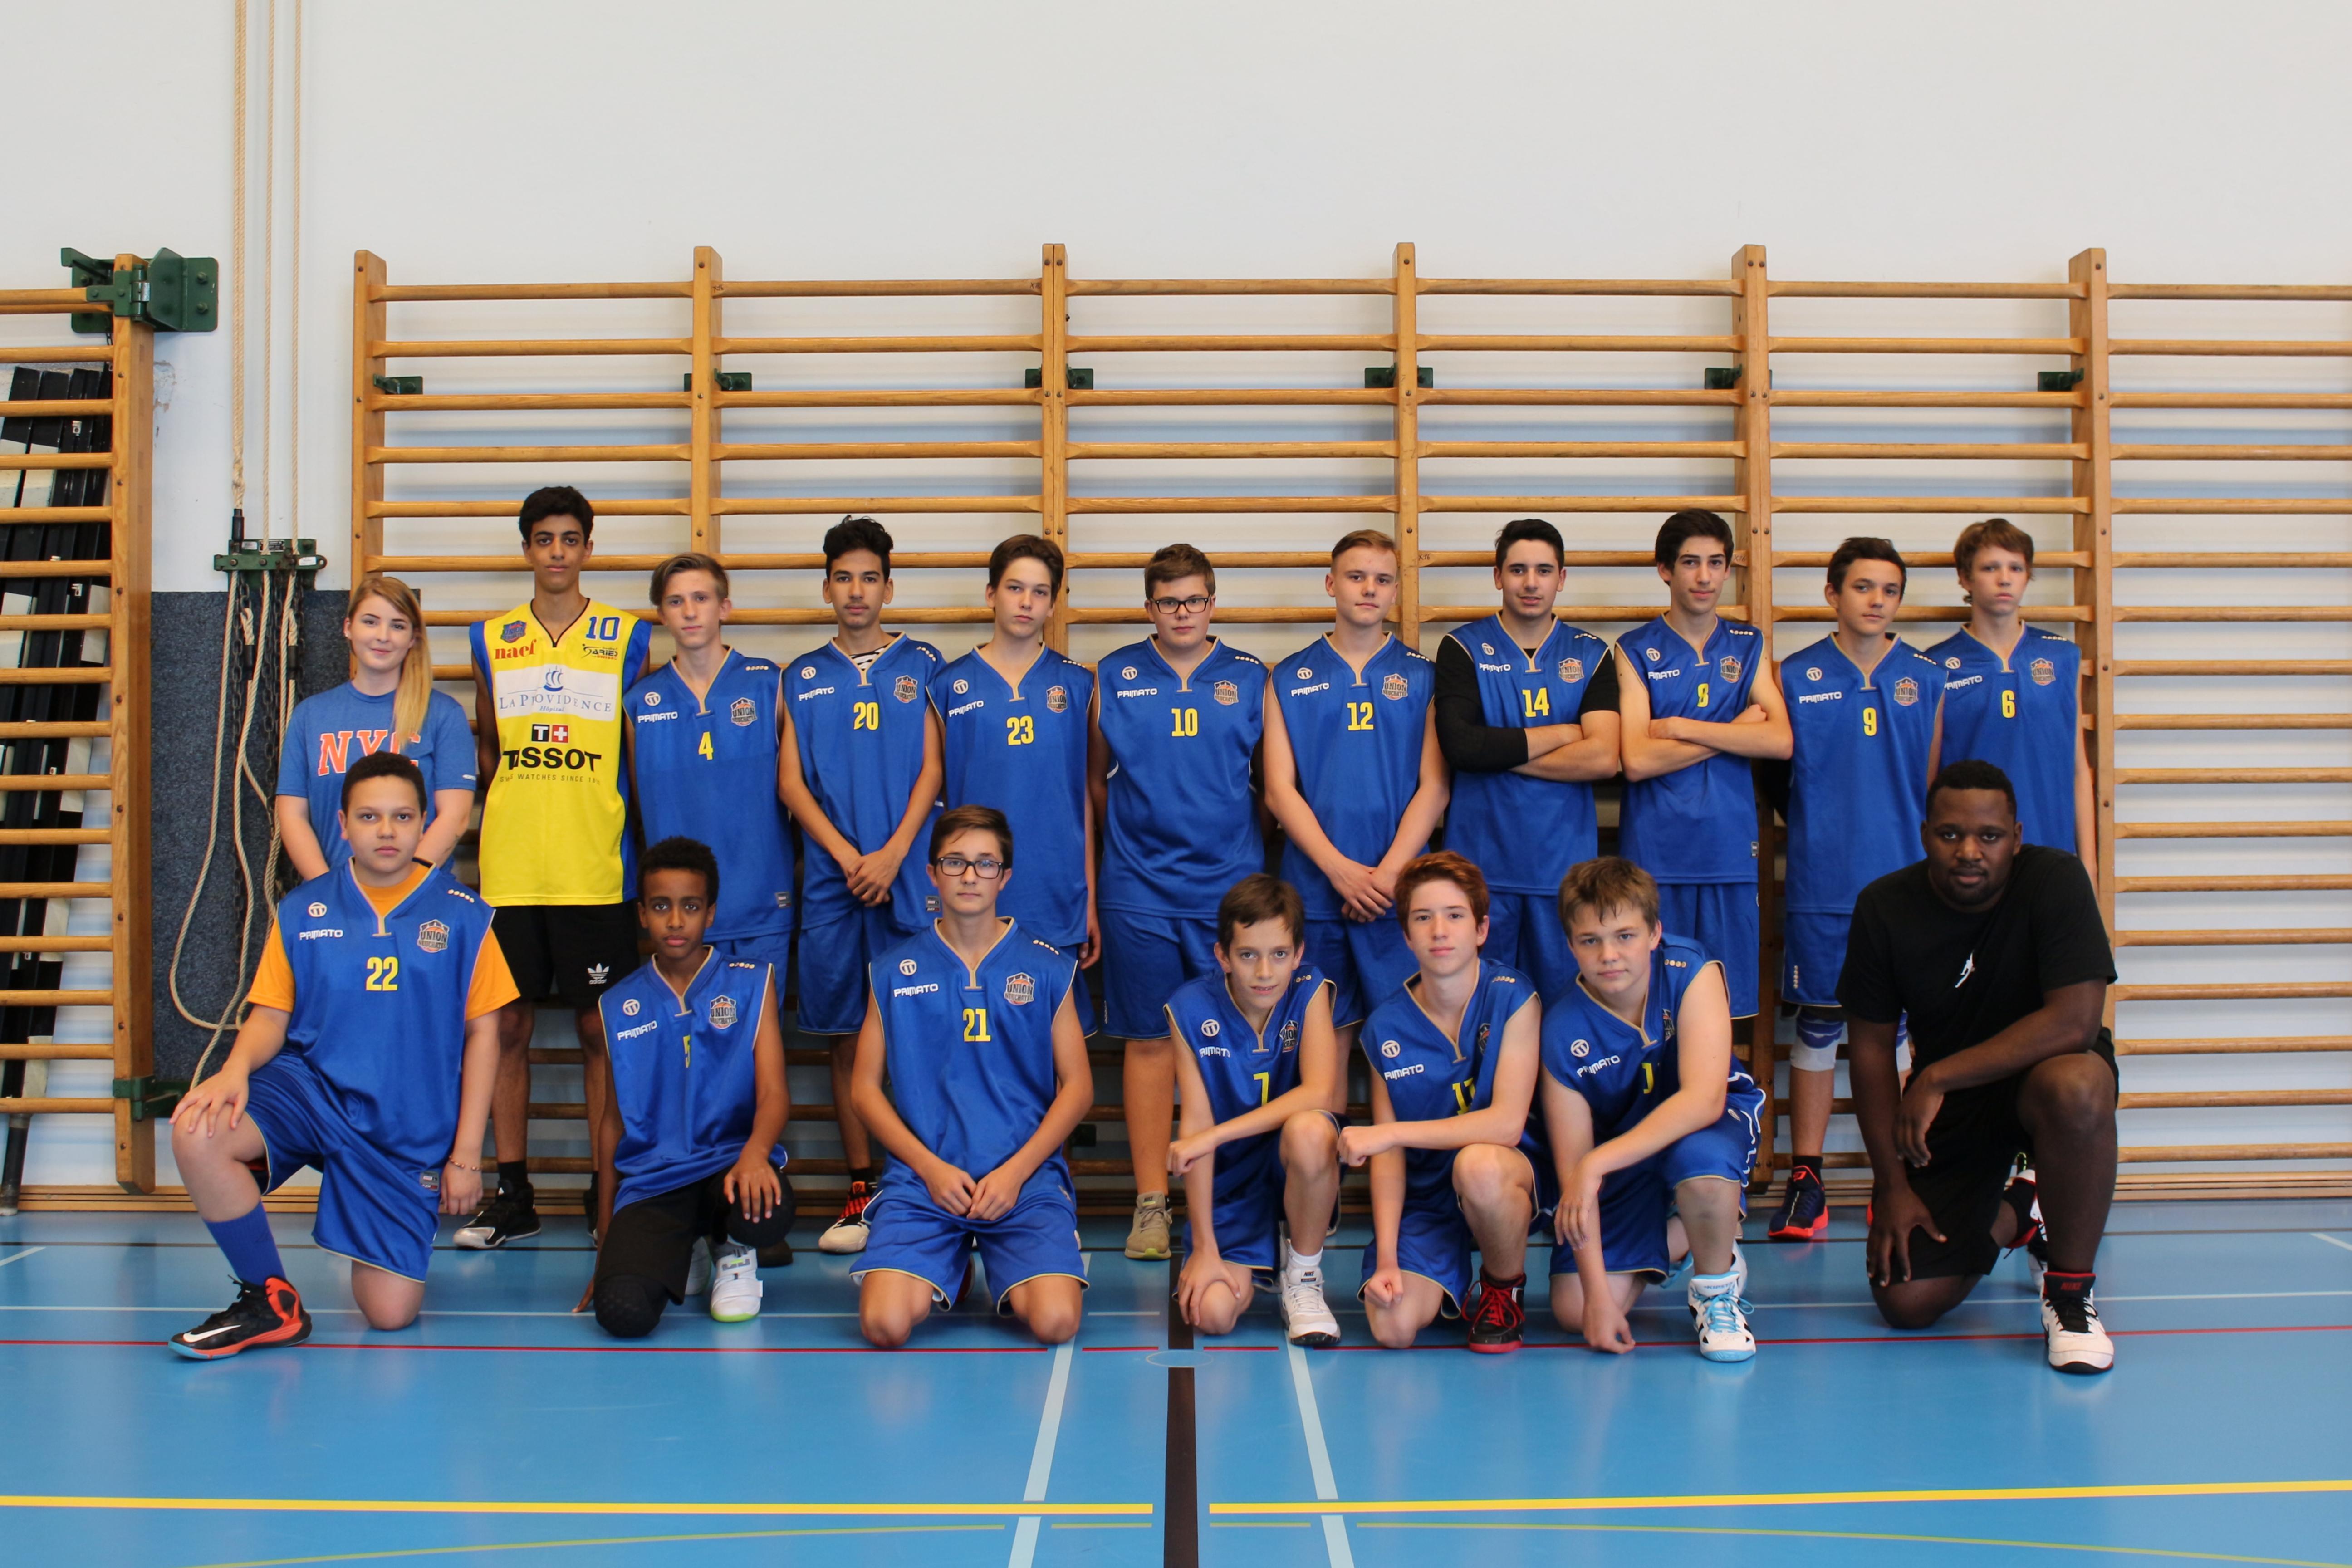 U16-2 - Cadets